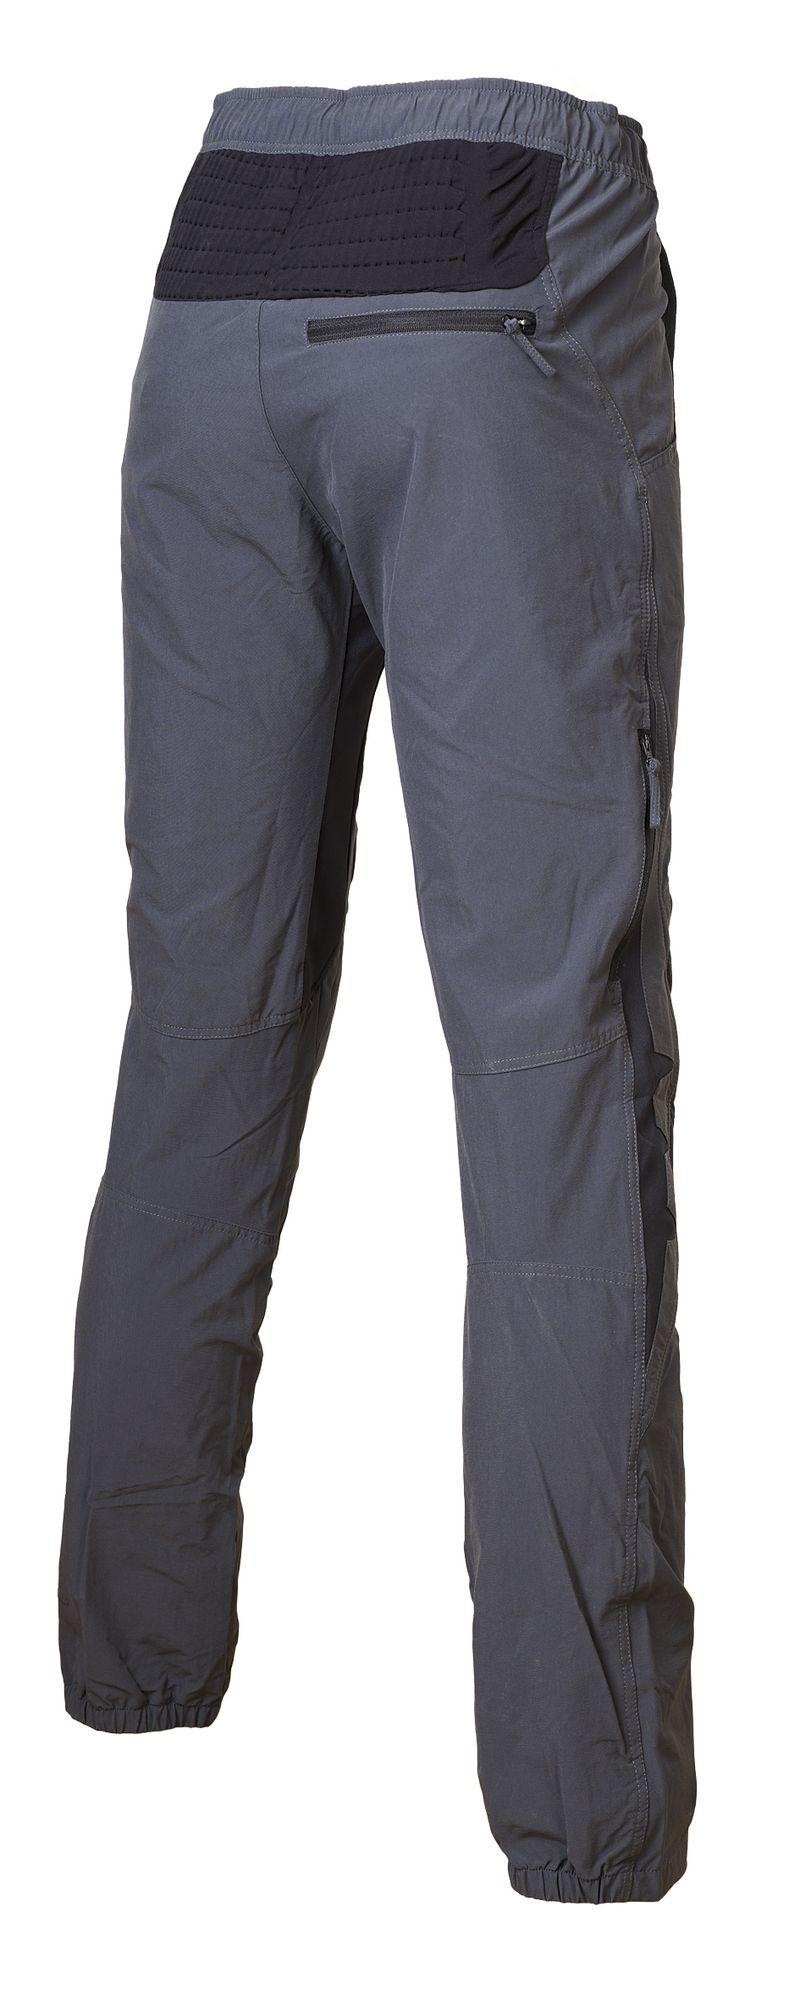 Outdoor Pants Long - back